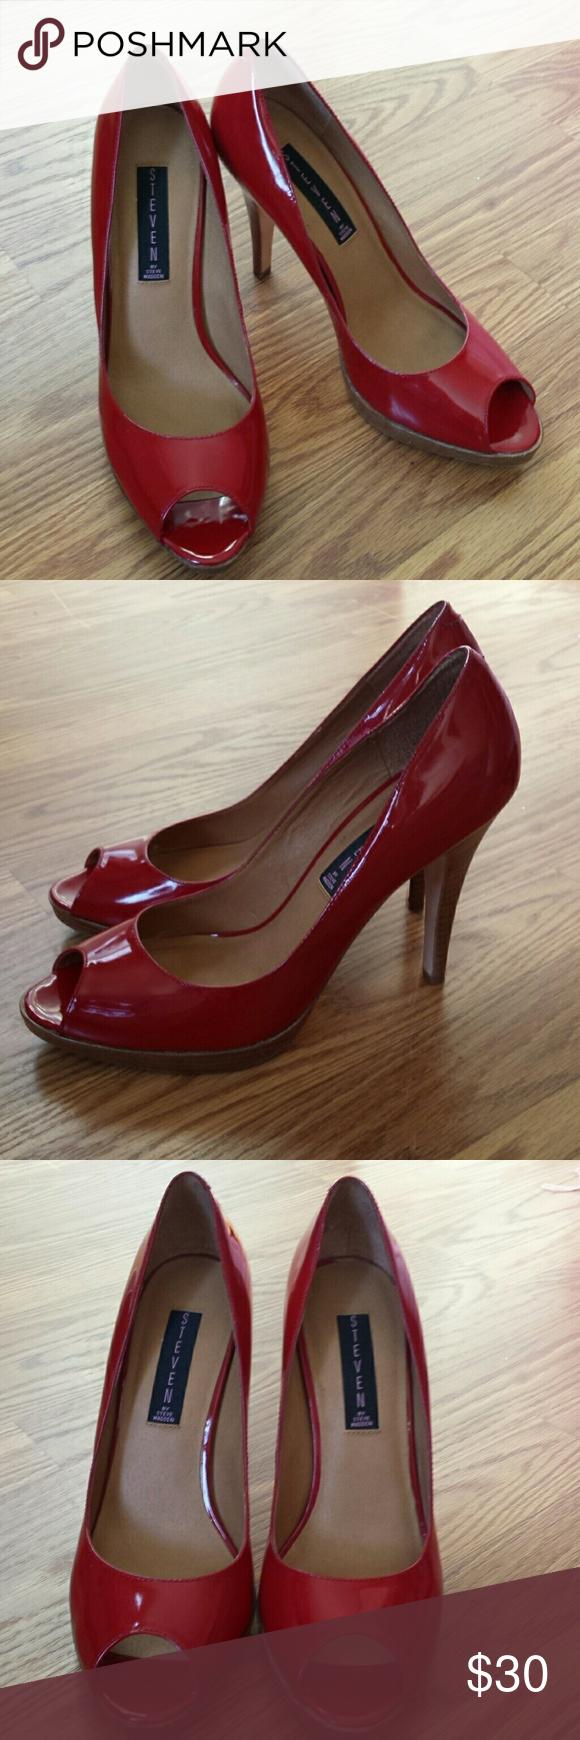 Steve Madden heels Shiny red leather peep toe pumps by Steve Madden Size 9M Steve Madden Shoes Heels